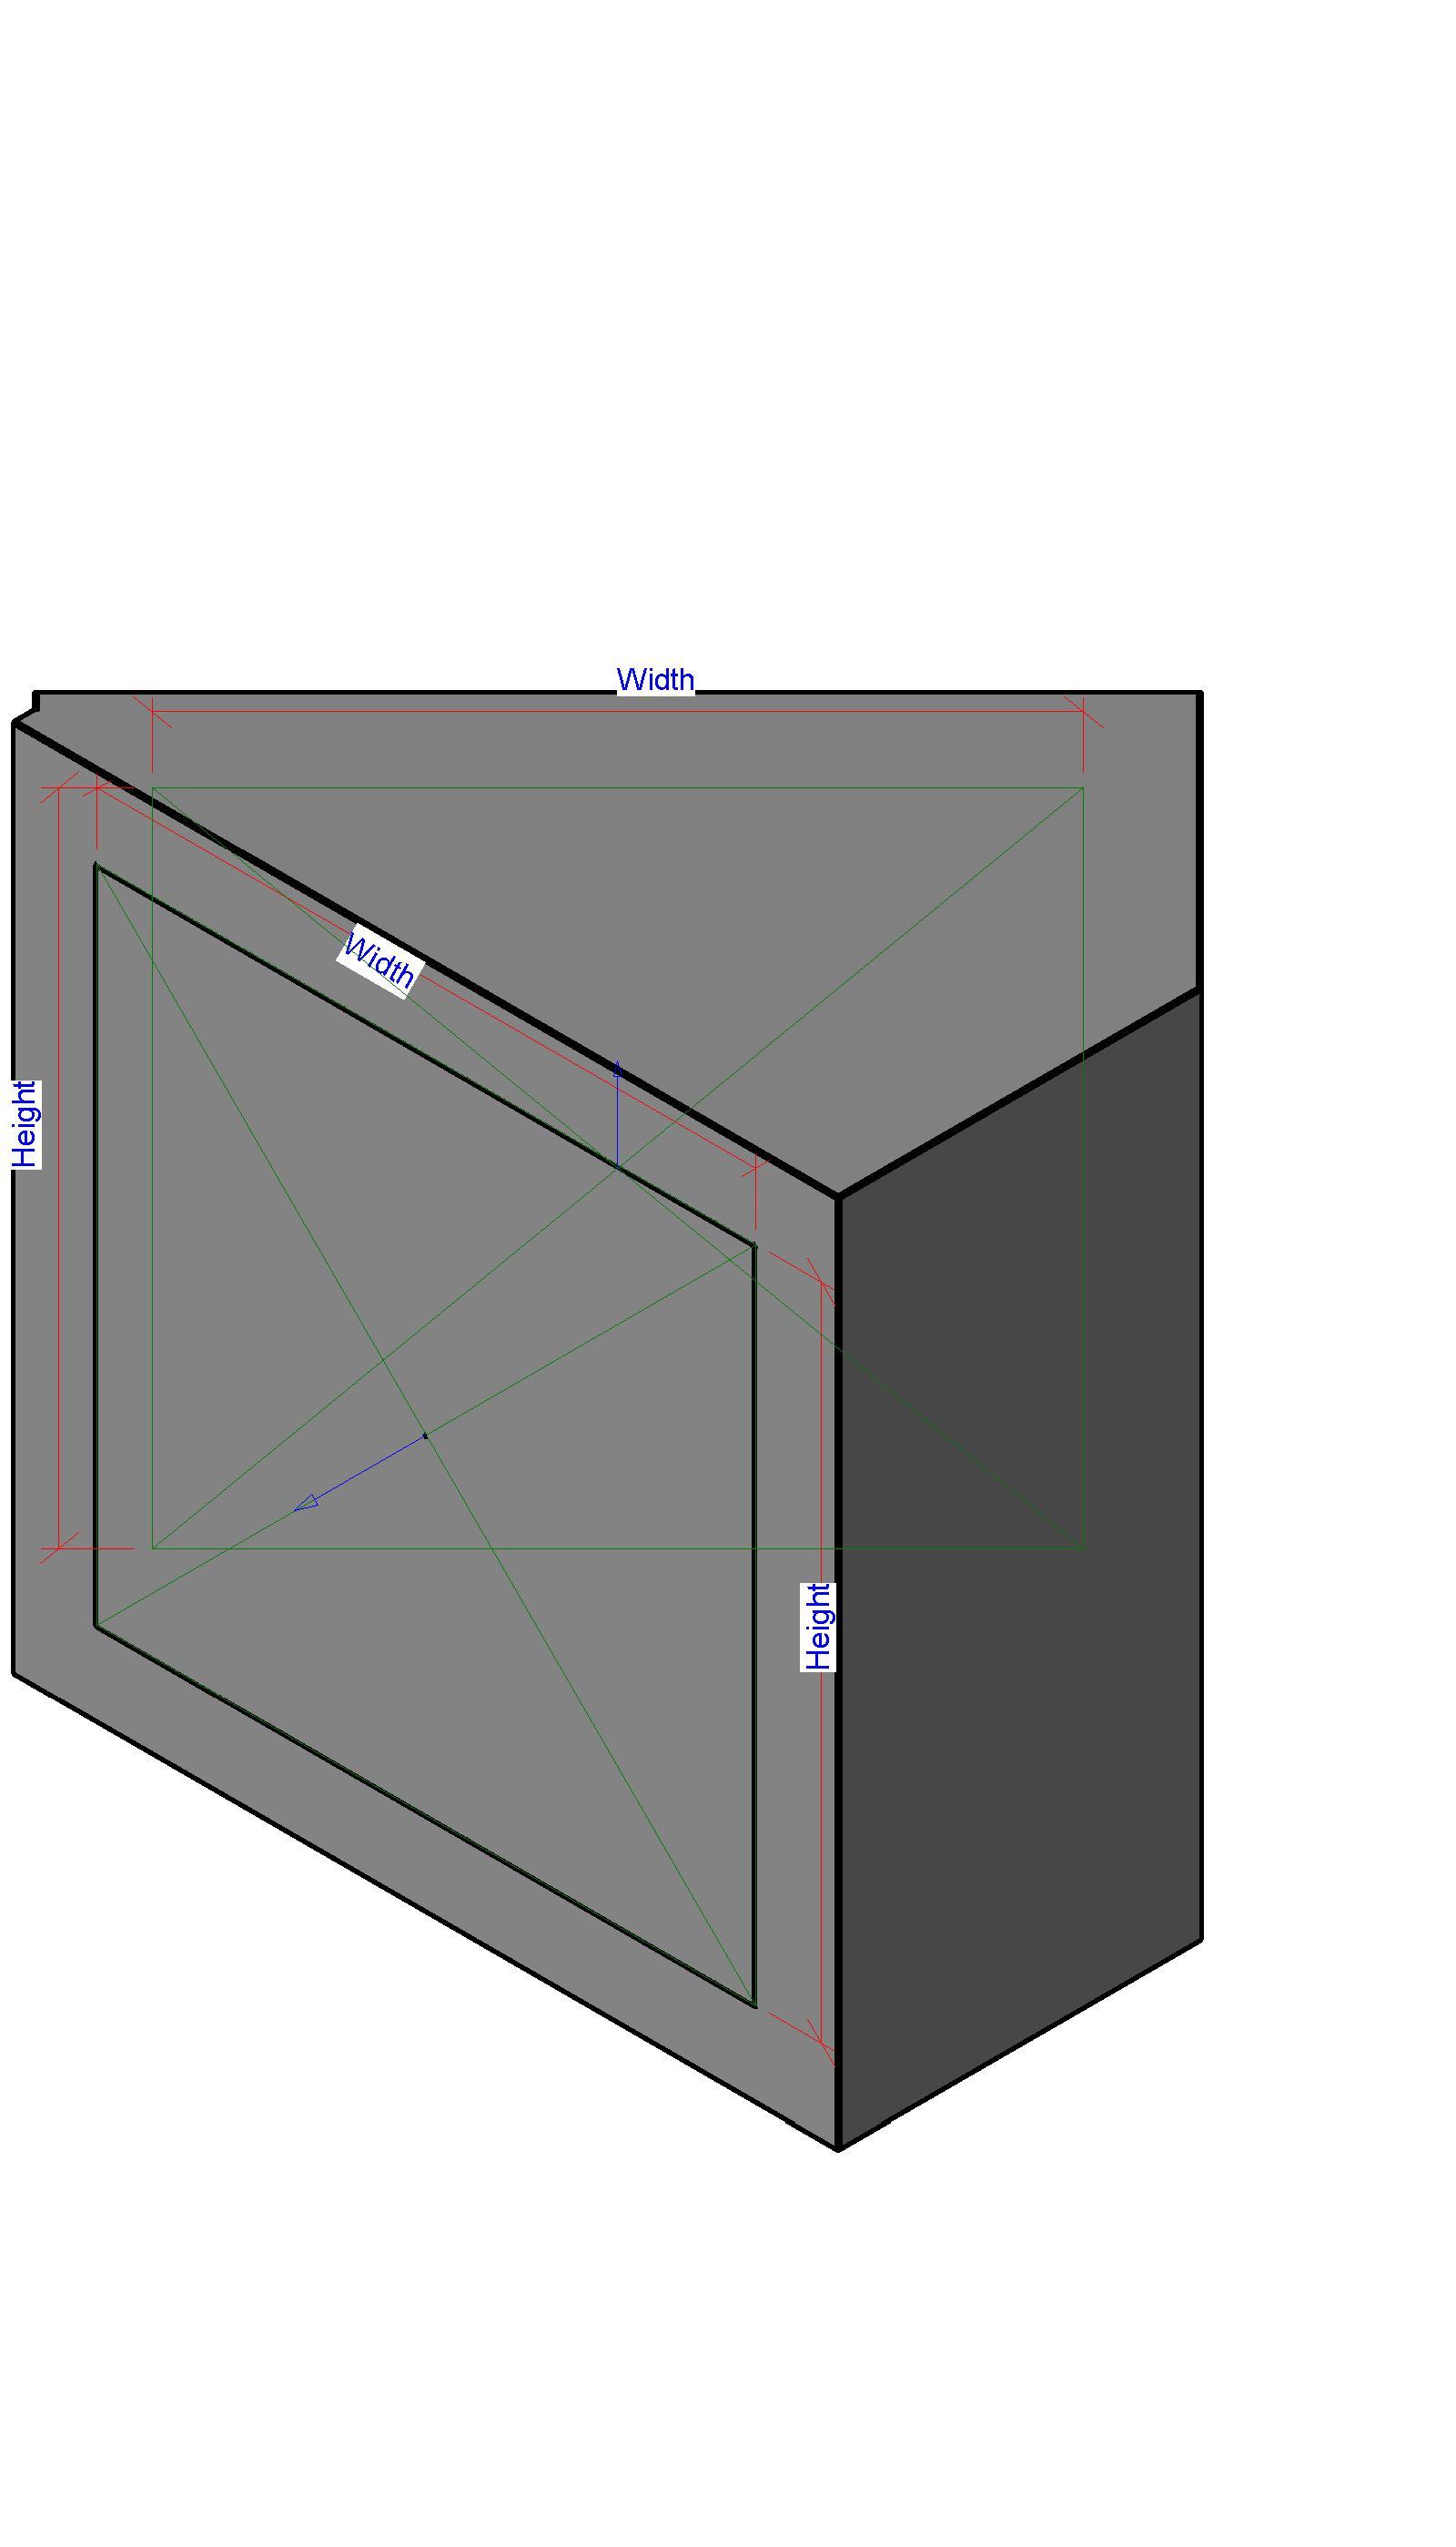 Kingspan Insulation LLC - BIM Objects / Families